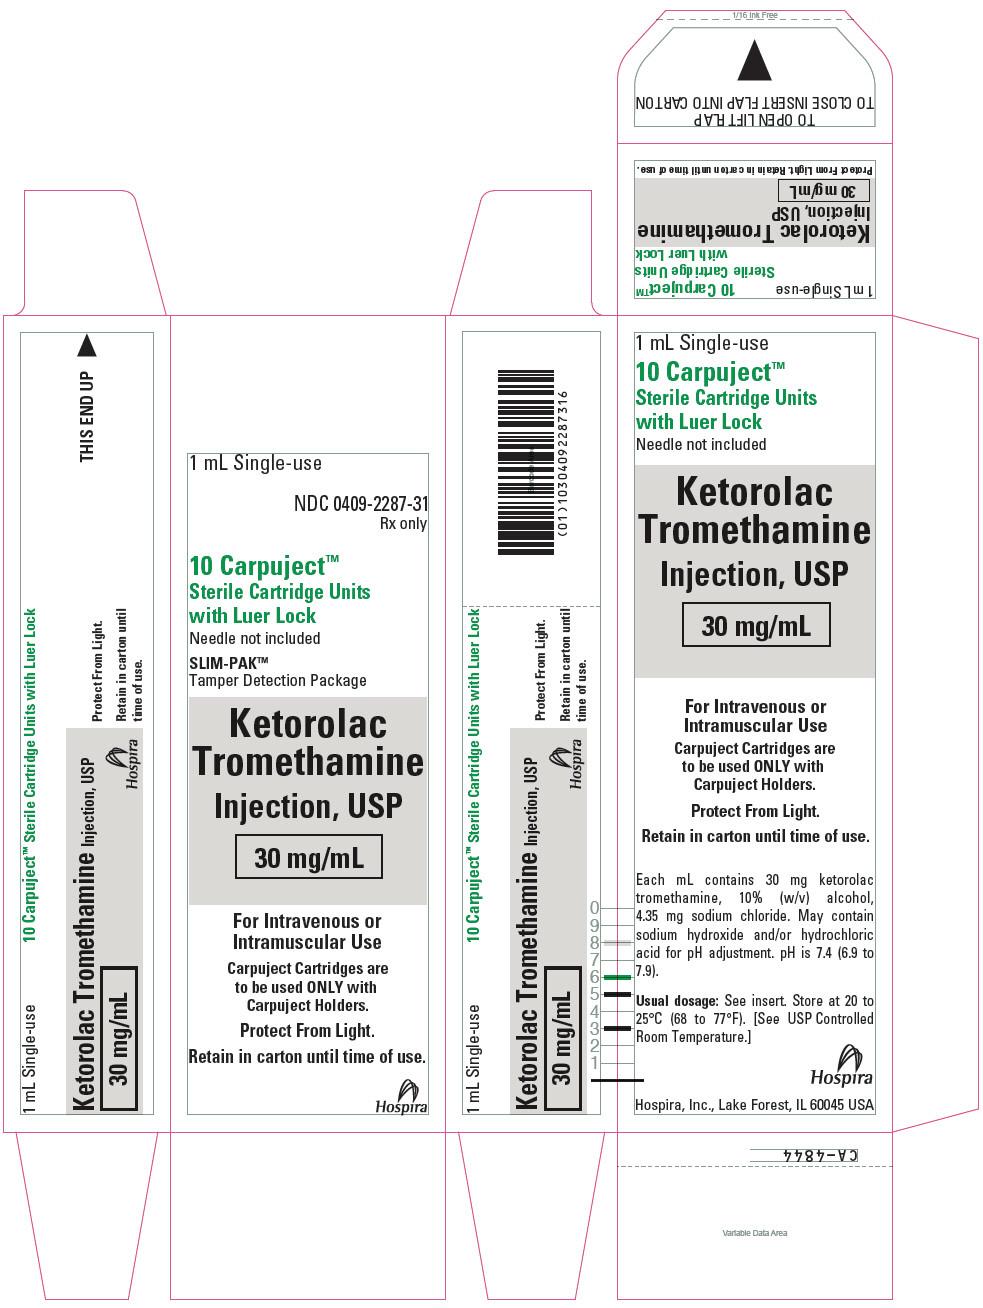 PRINCIPAL DISPLAY PANEL - 30 mg/mL Cartridge Carton